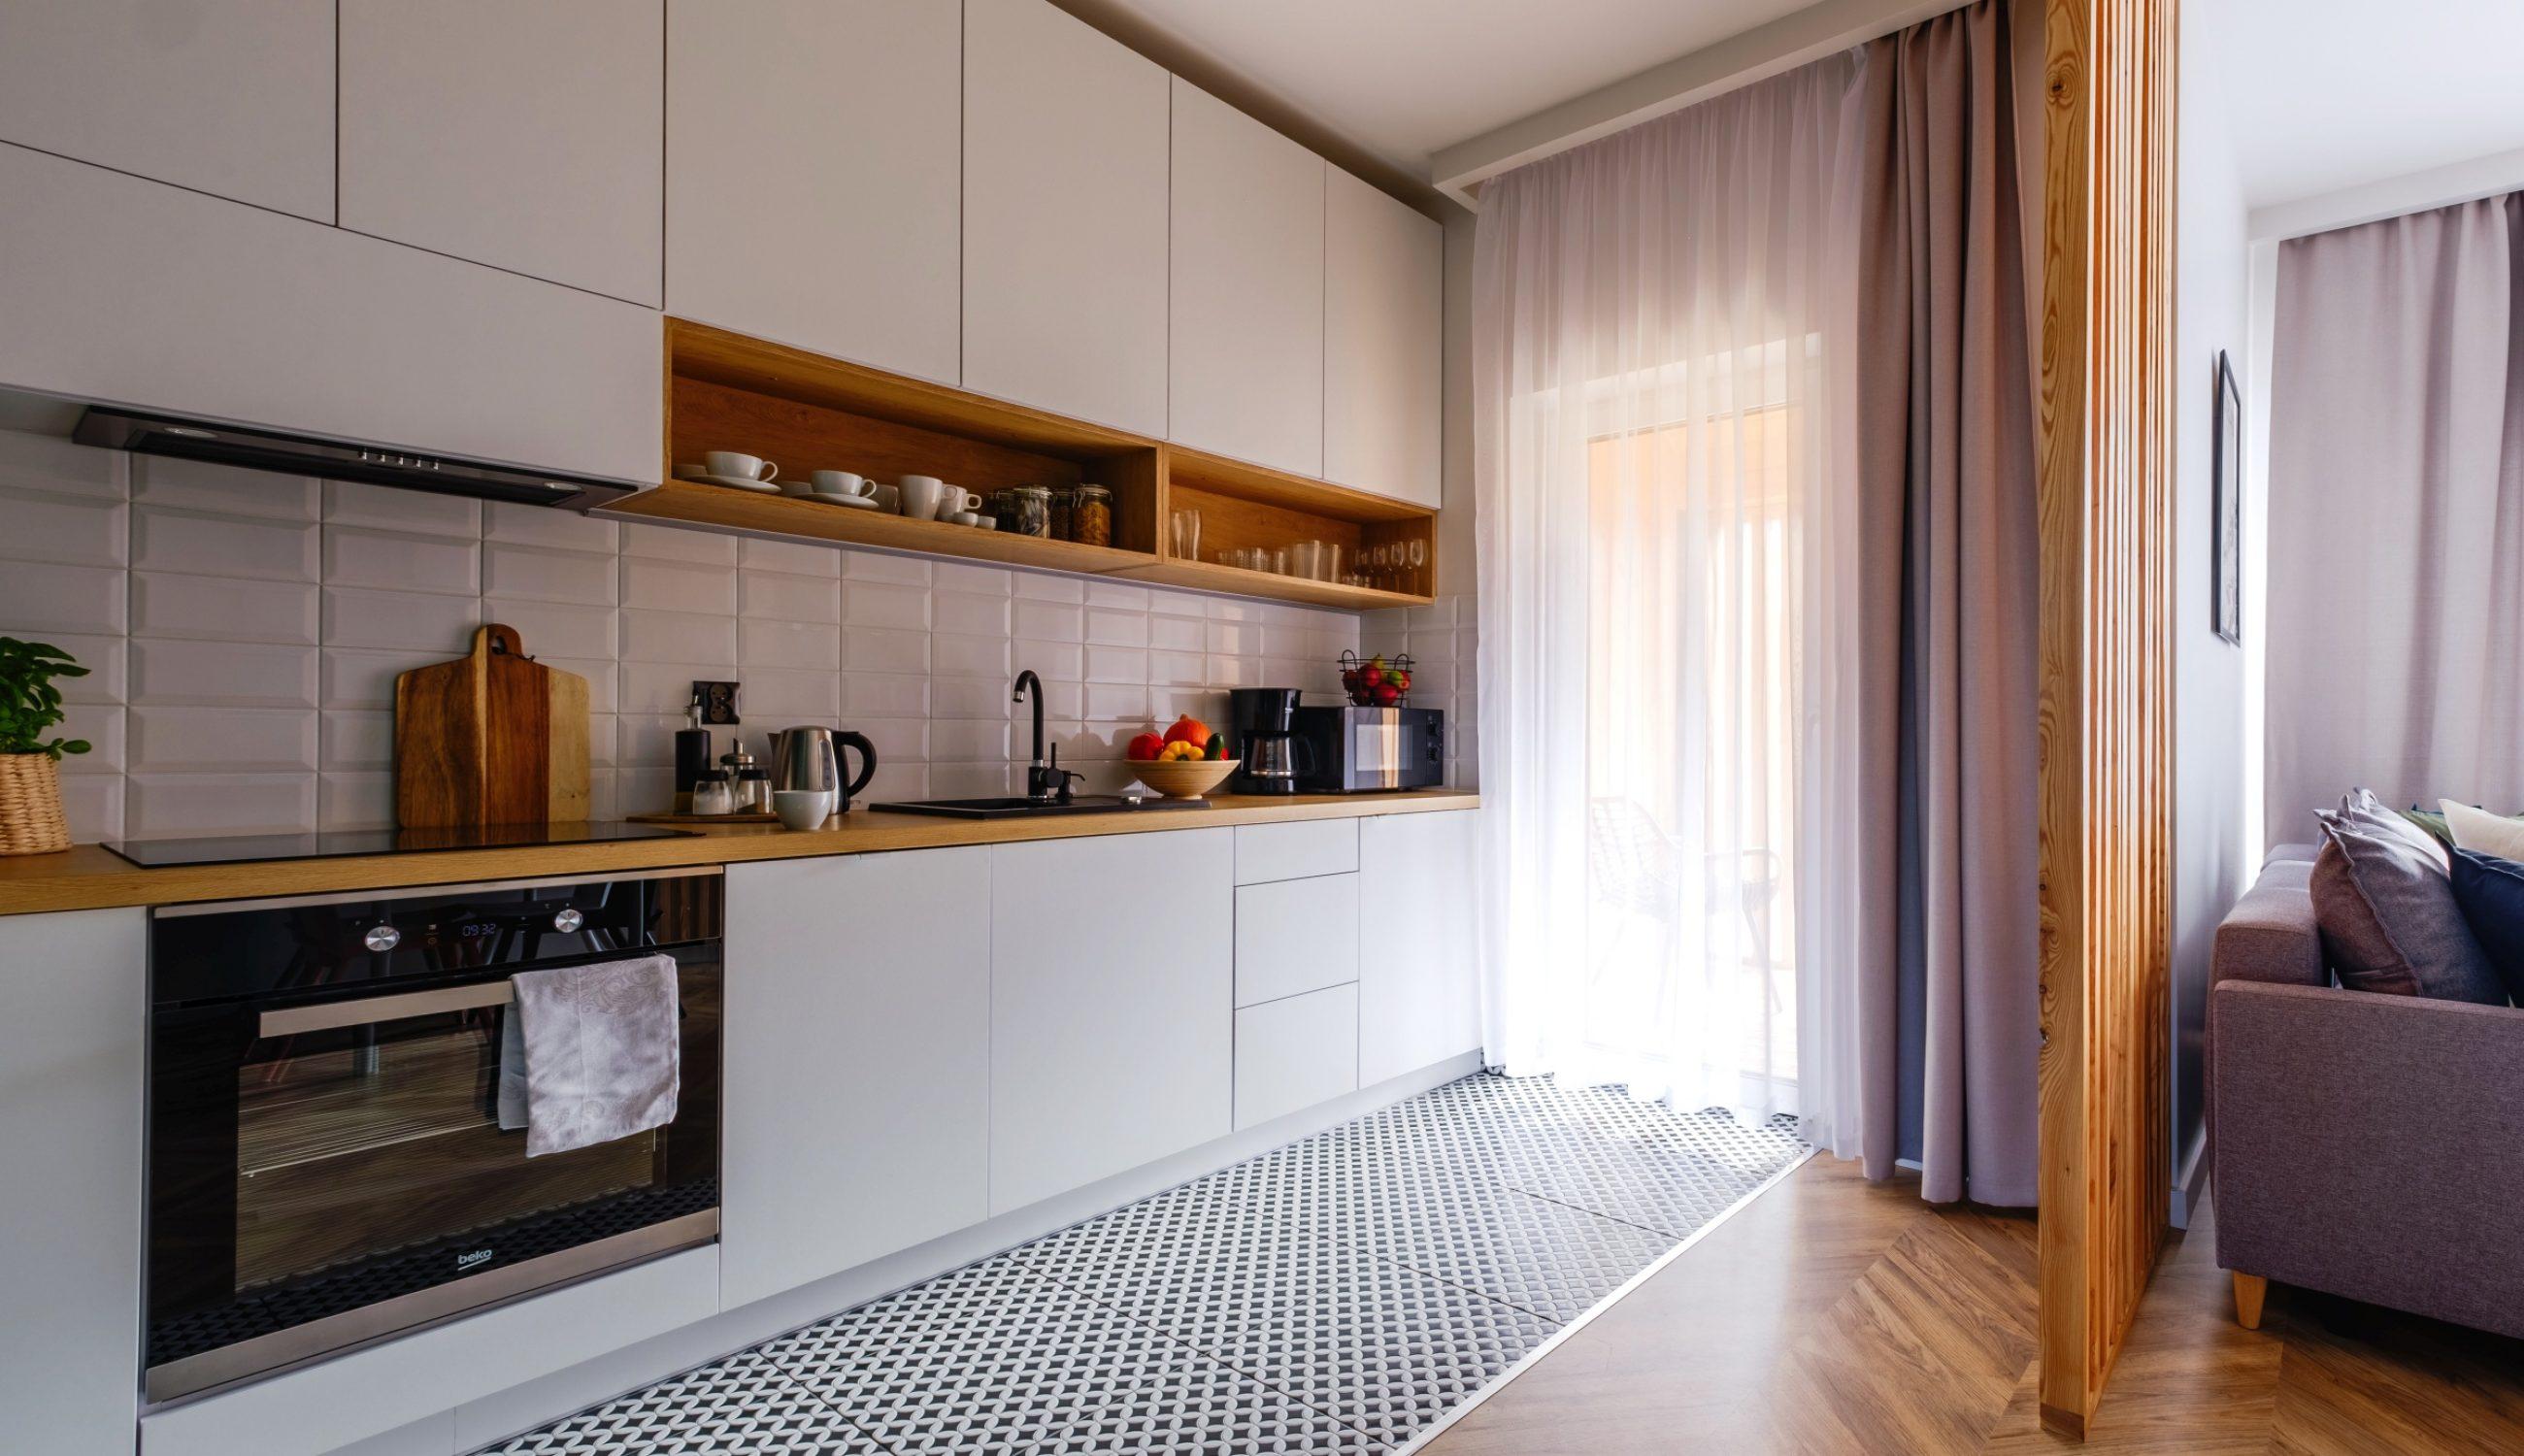 Apartamenty NOVA BIAŁKA Białka Tatrzańska apartament 5 aneks kuchenny